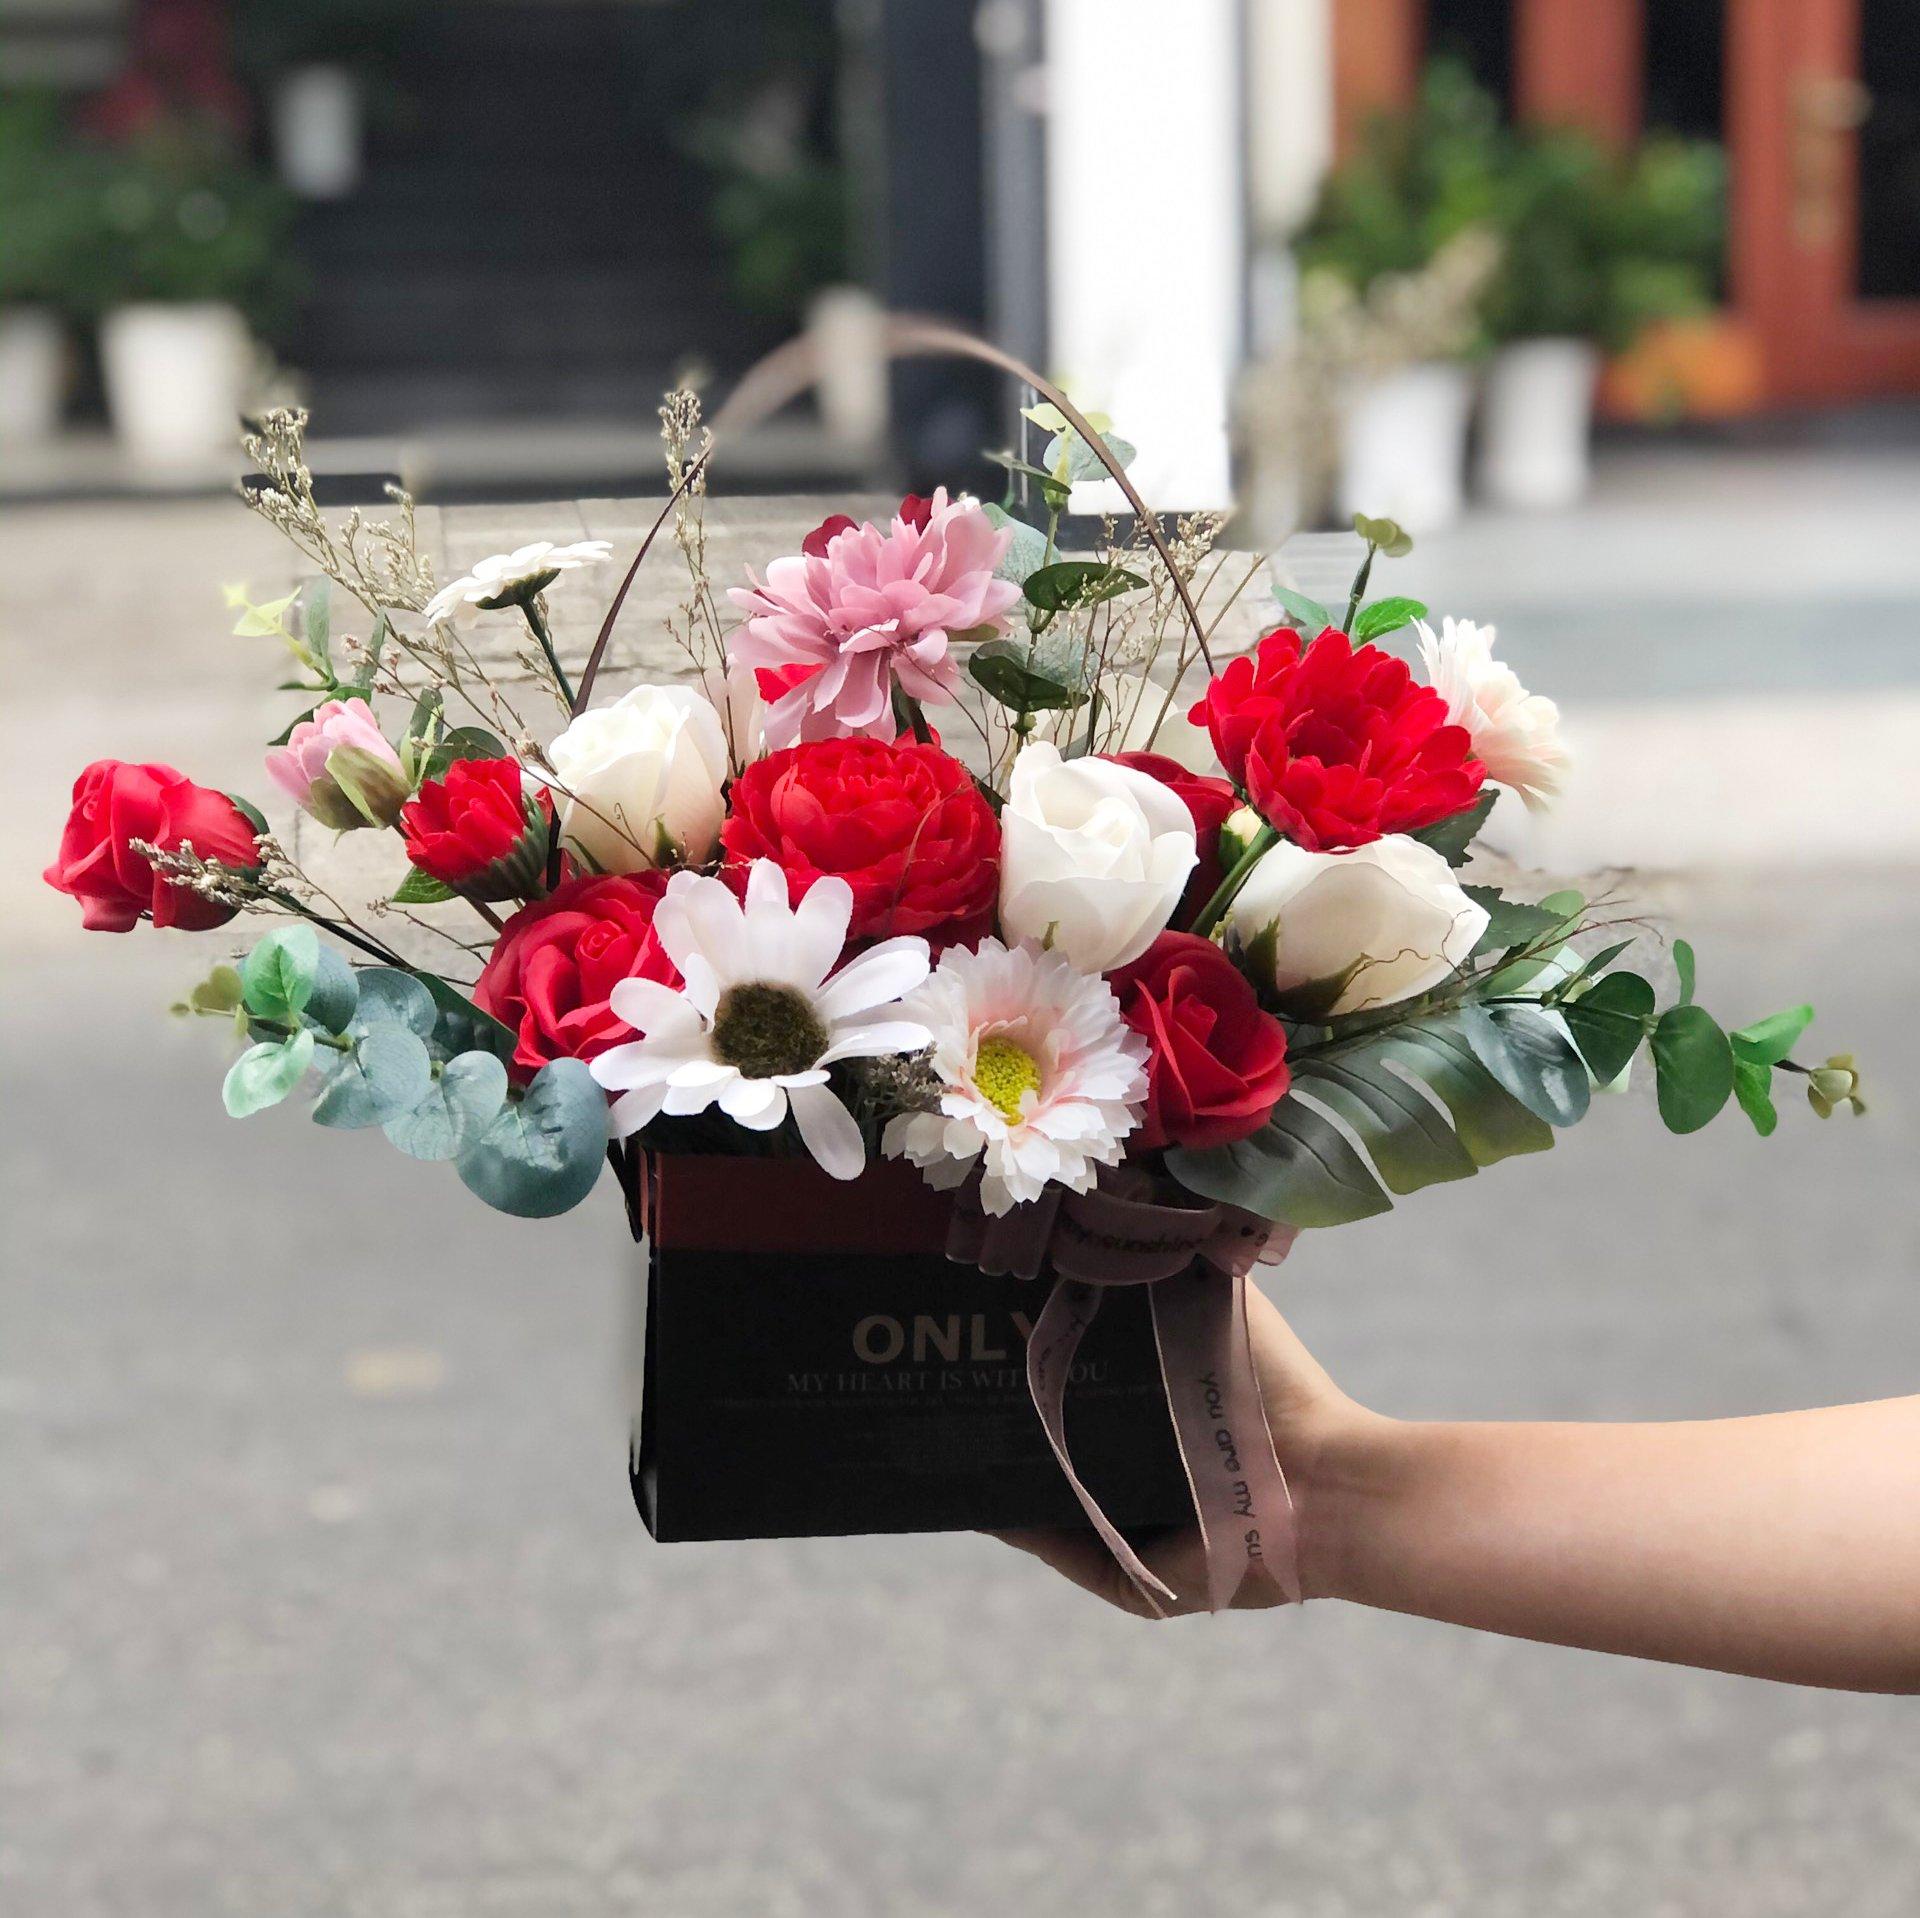 Giỏ hoa sáp sắc màu